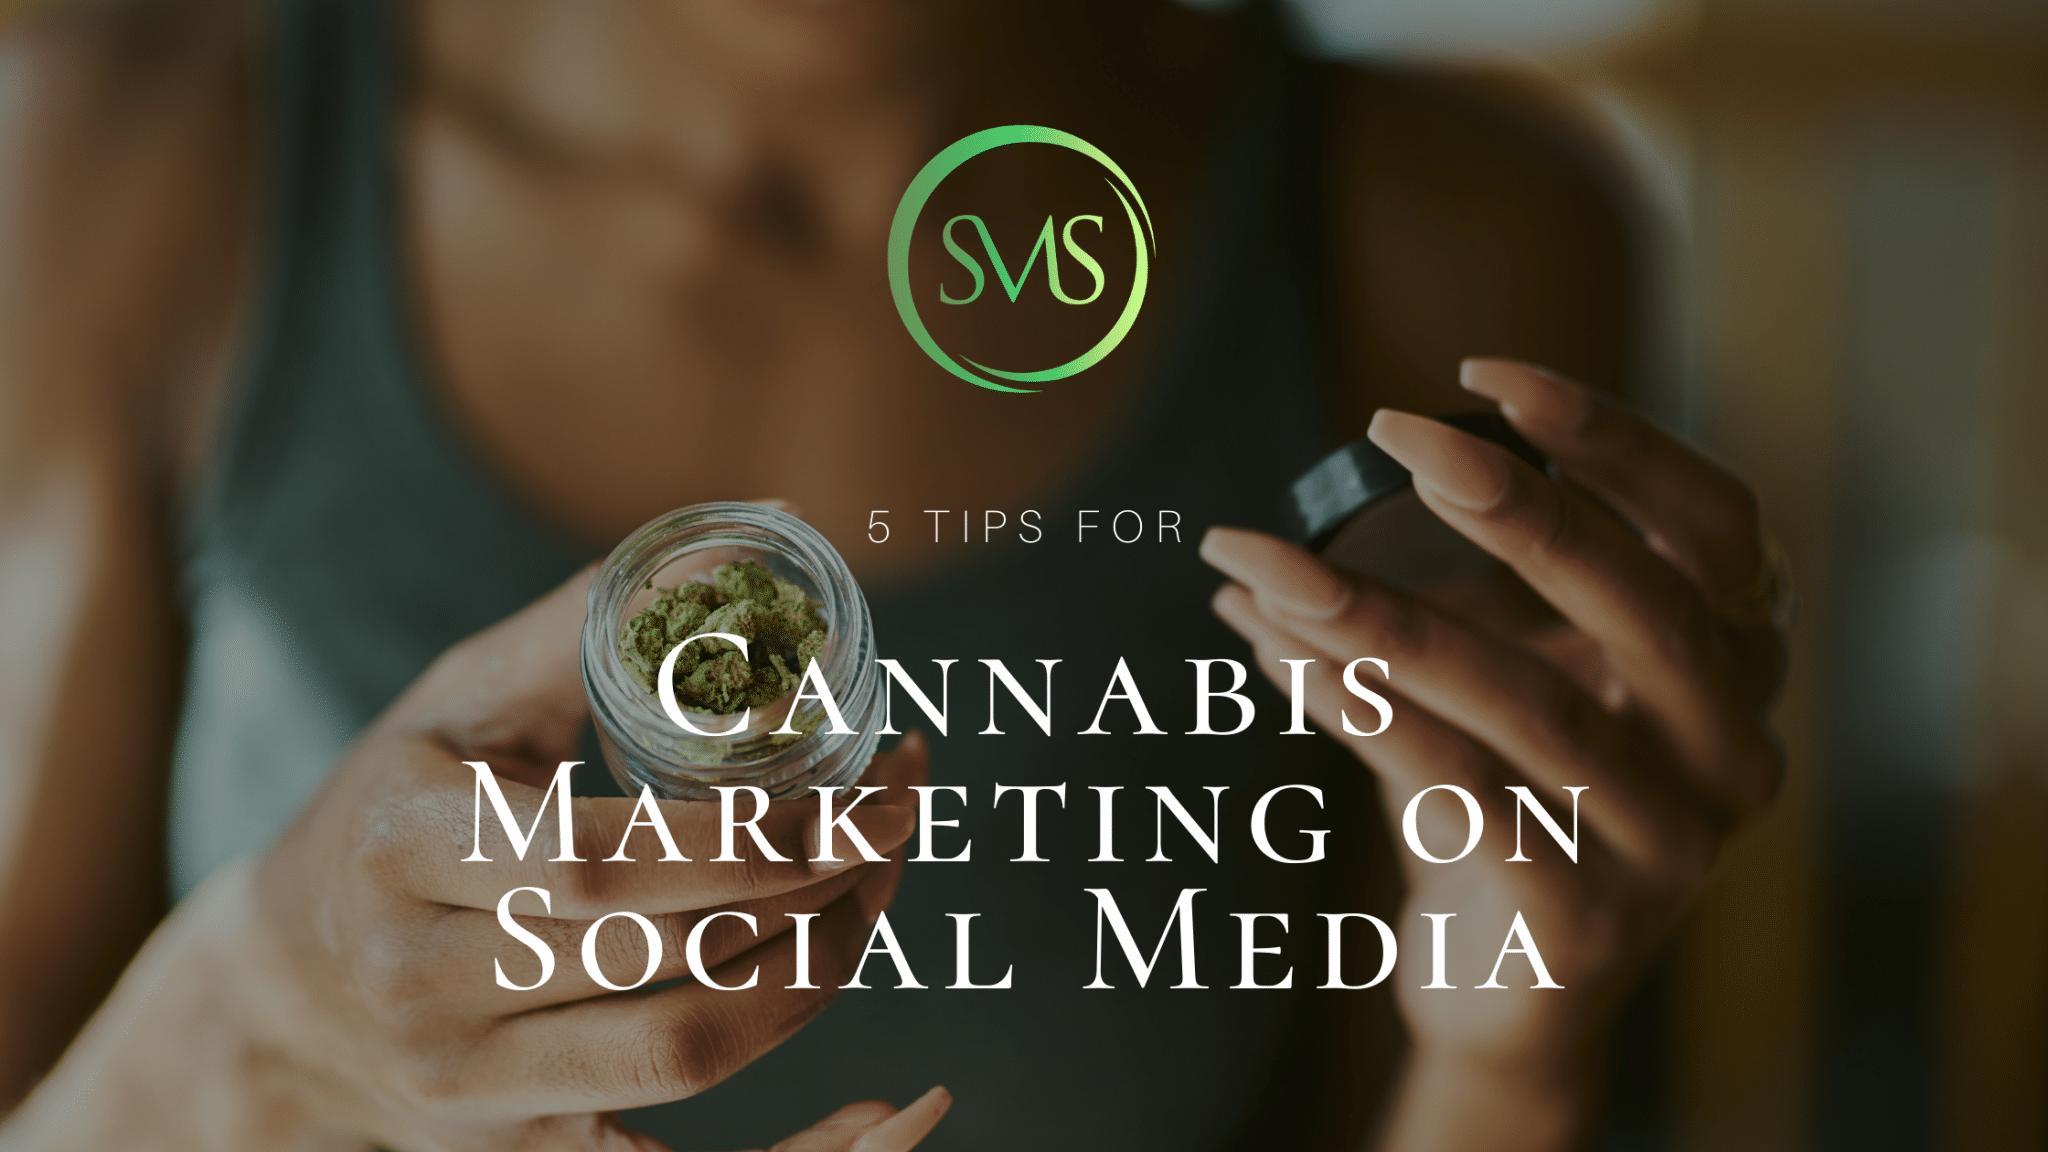 5 Tips For Cannabis Marketing on Social Media